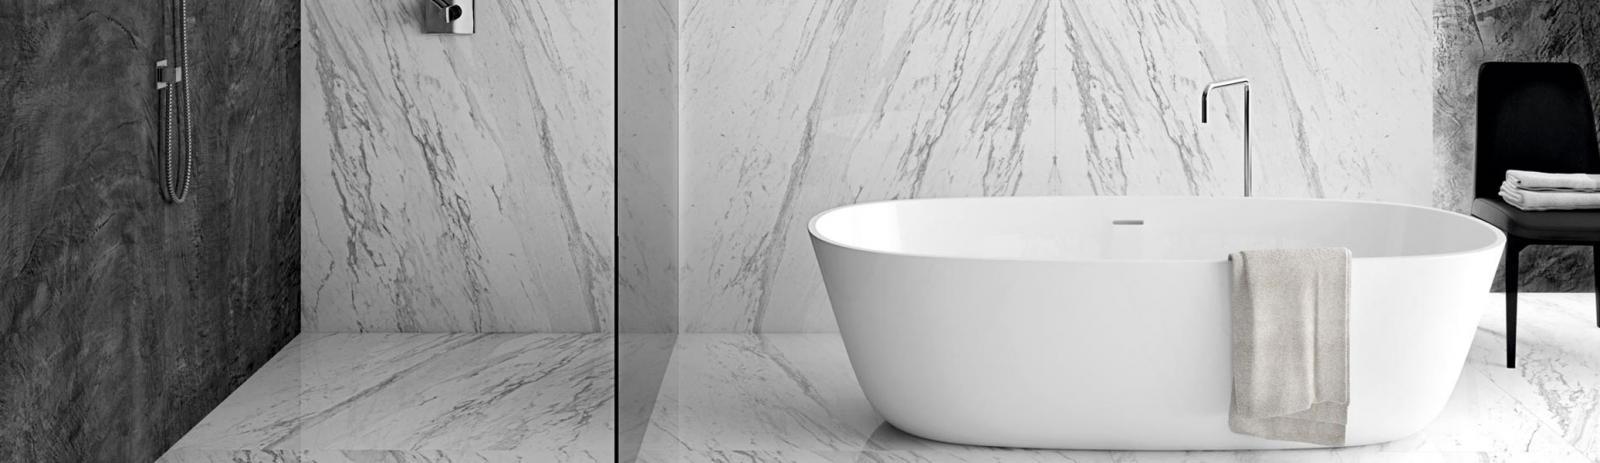 Banner-47x102-Porcelain-Countertop-Slabs-Anaheim